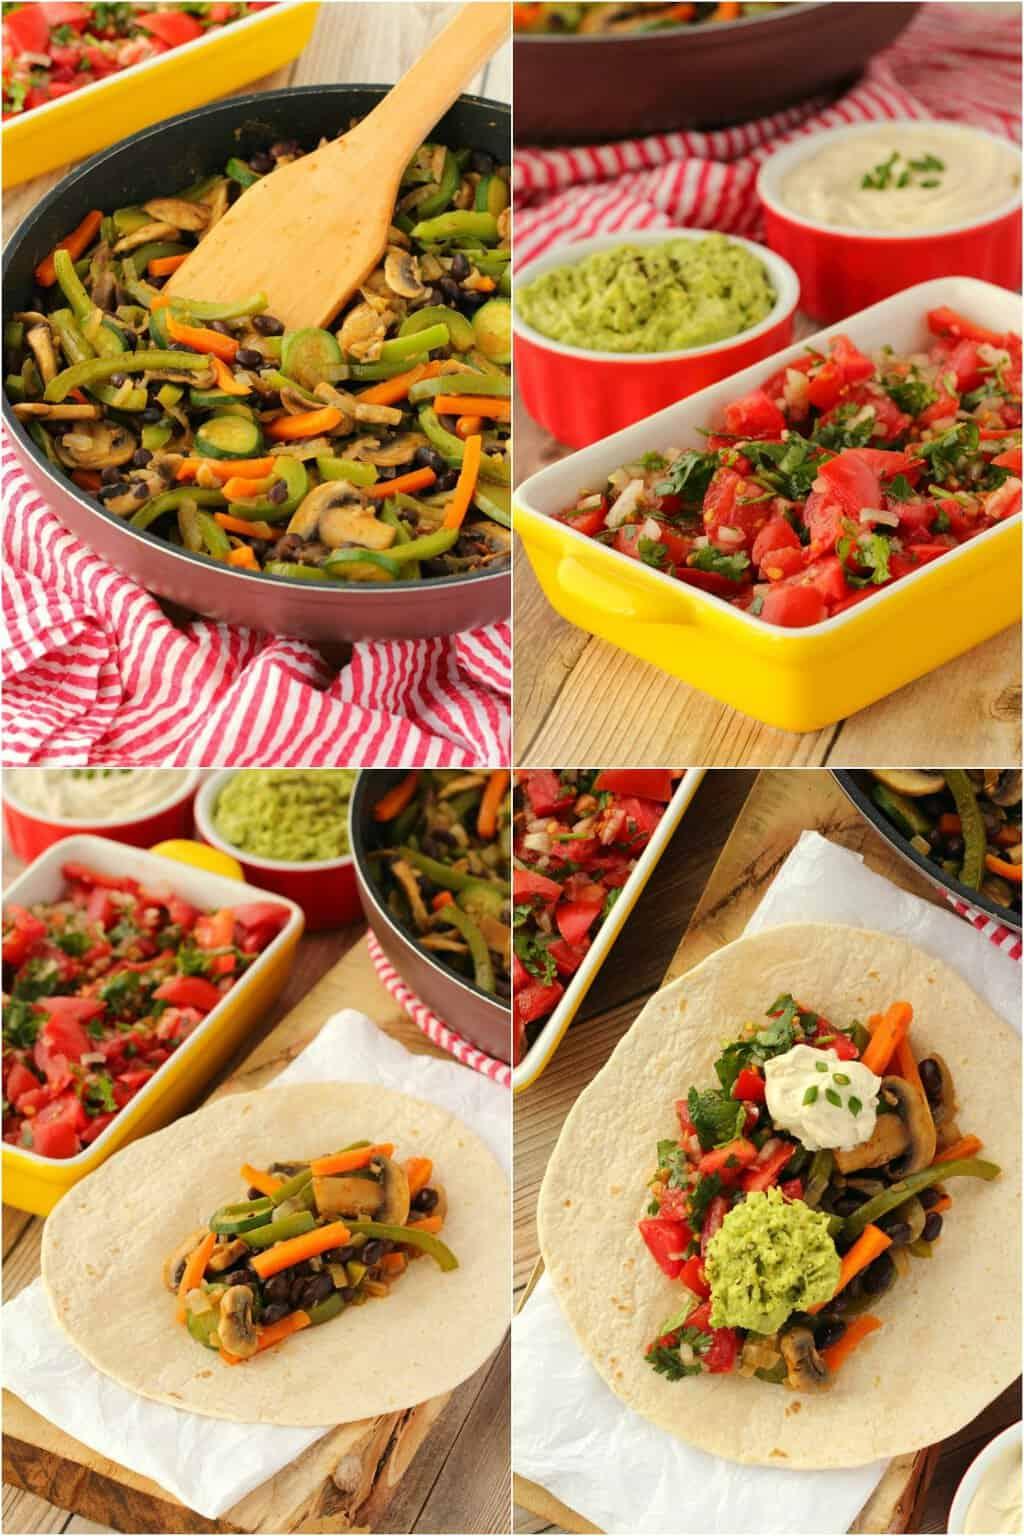 Step by step process photo collage of making vegan fajitas.